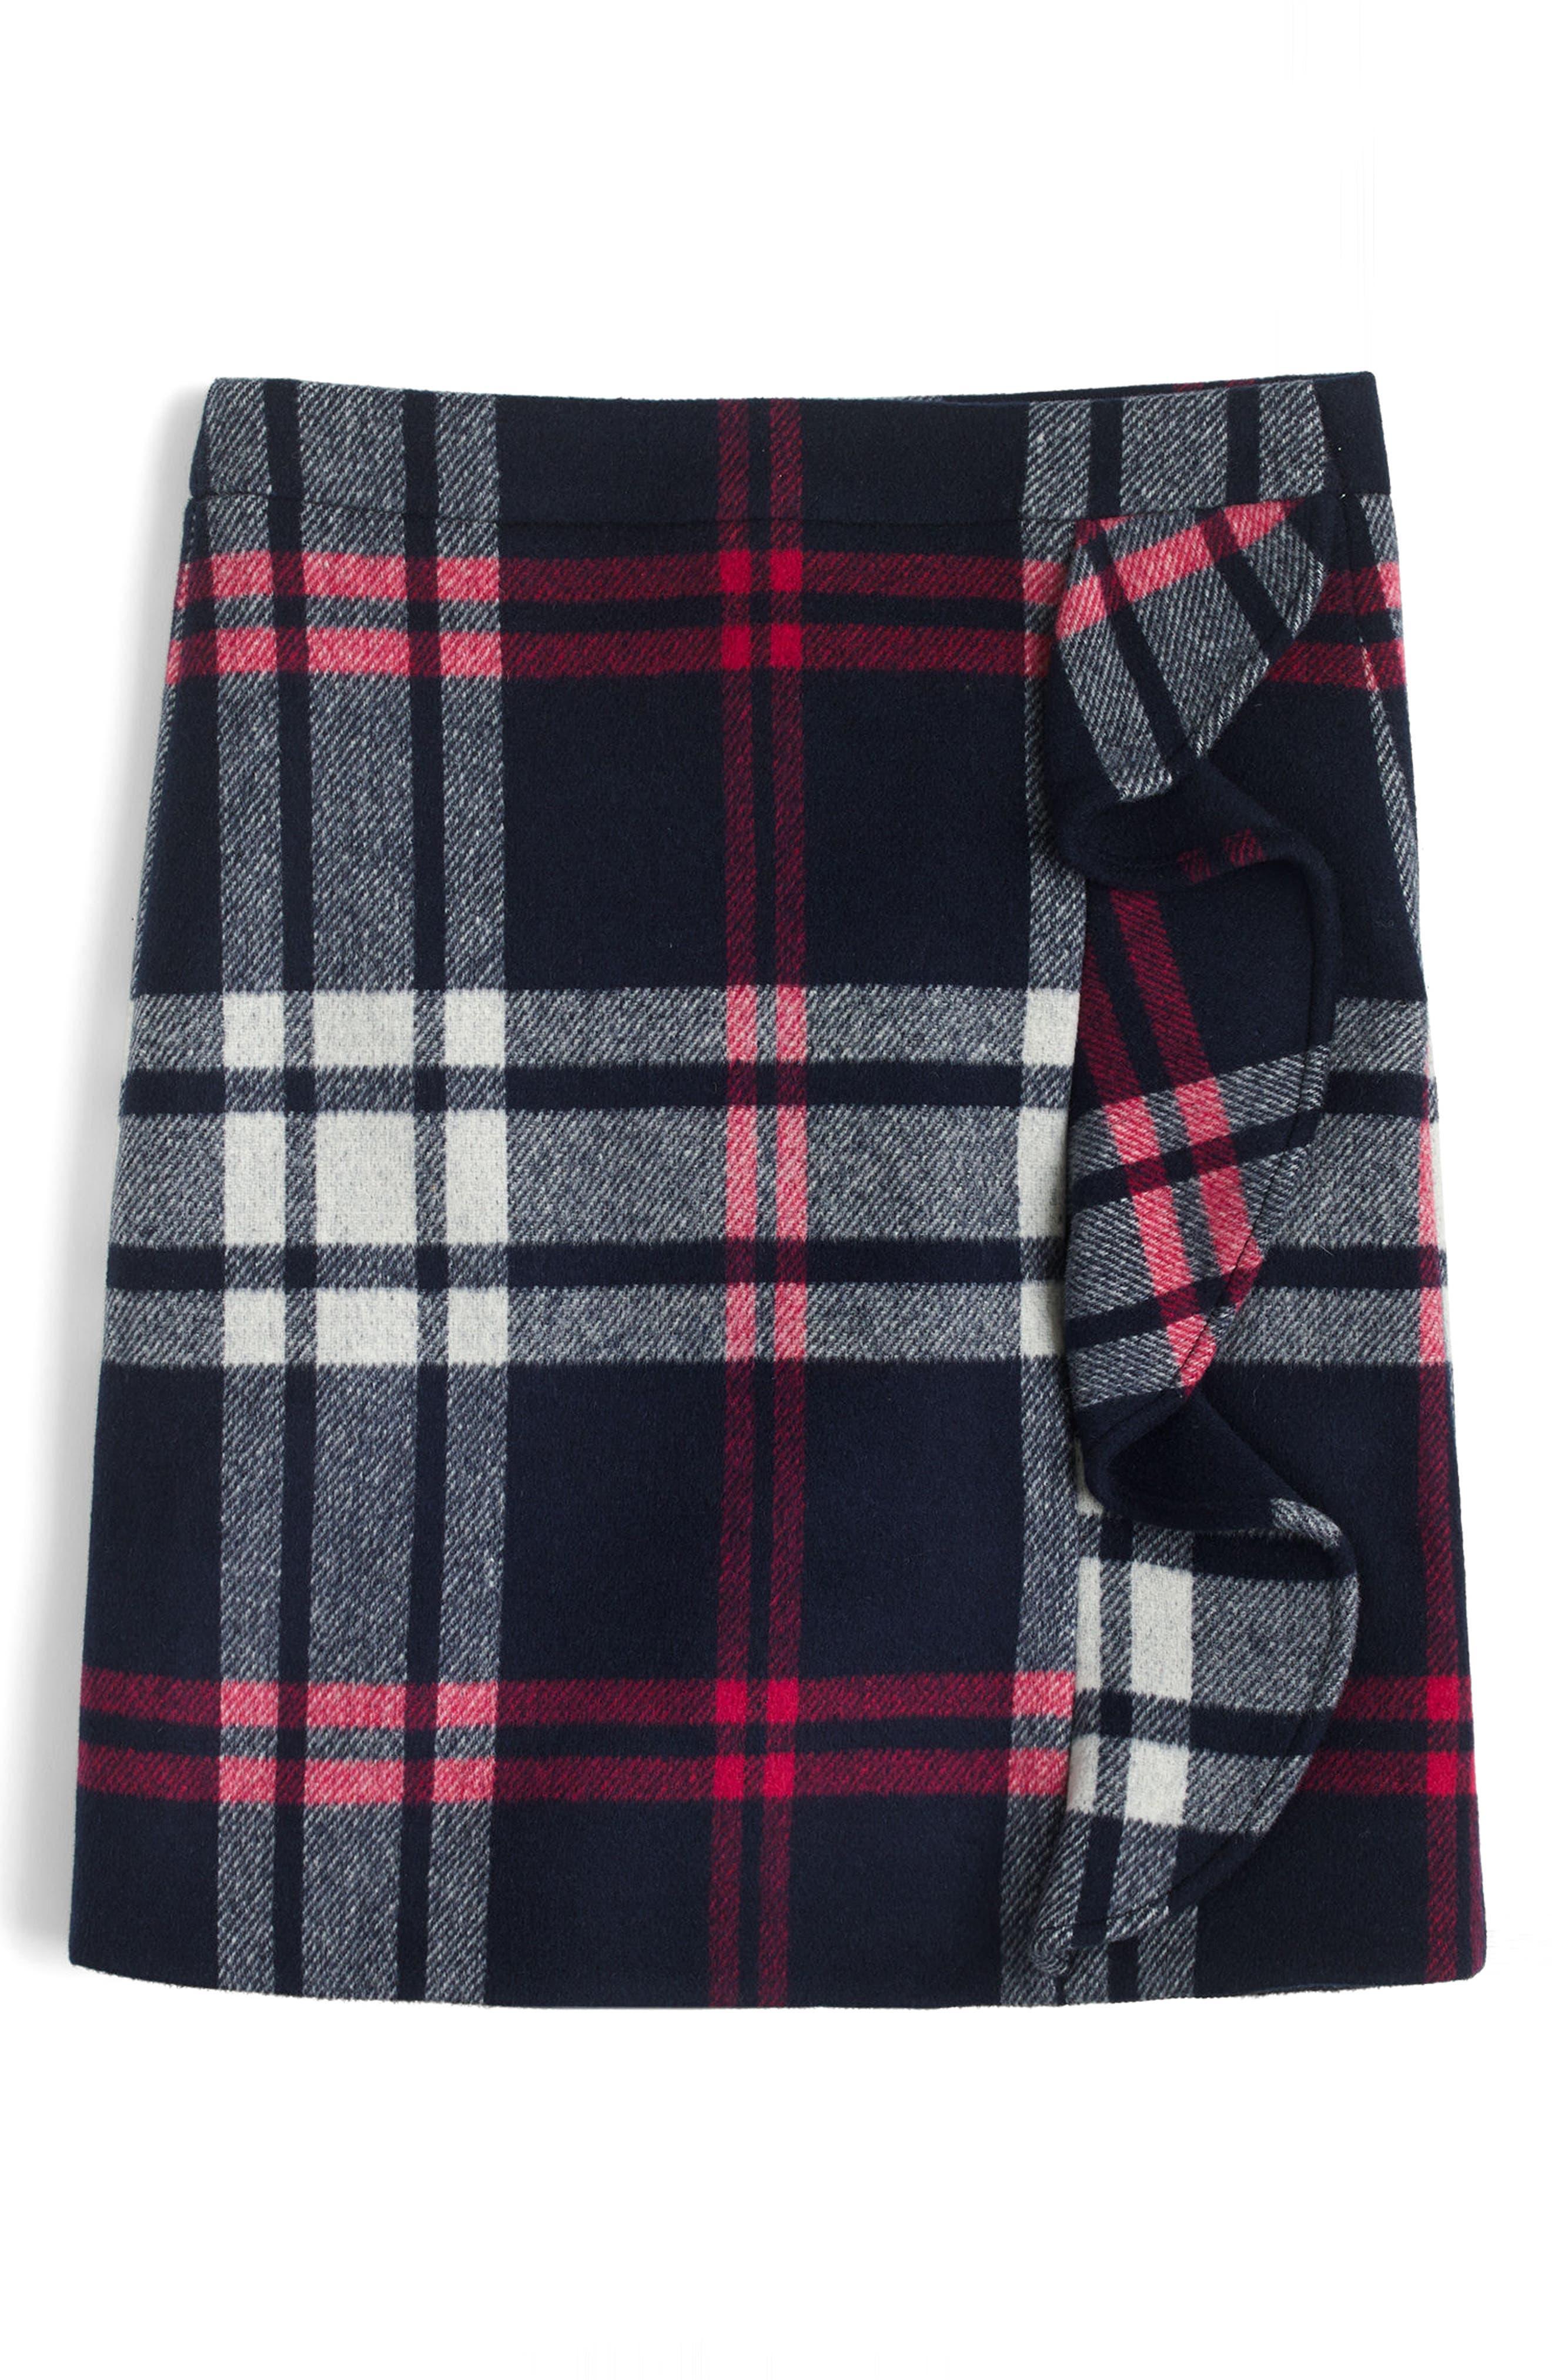 Plaid Ruffle Double-Serge Wool Mini Skirt,                             Alternate thumbnail 4, color,                             Red Navy White